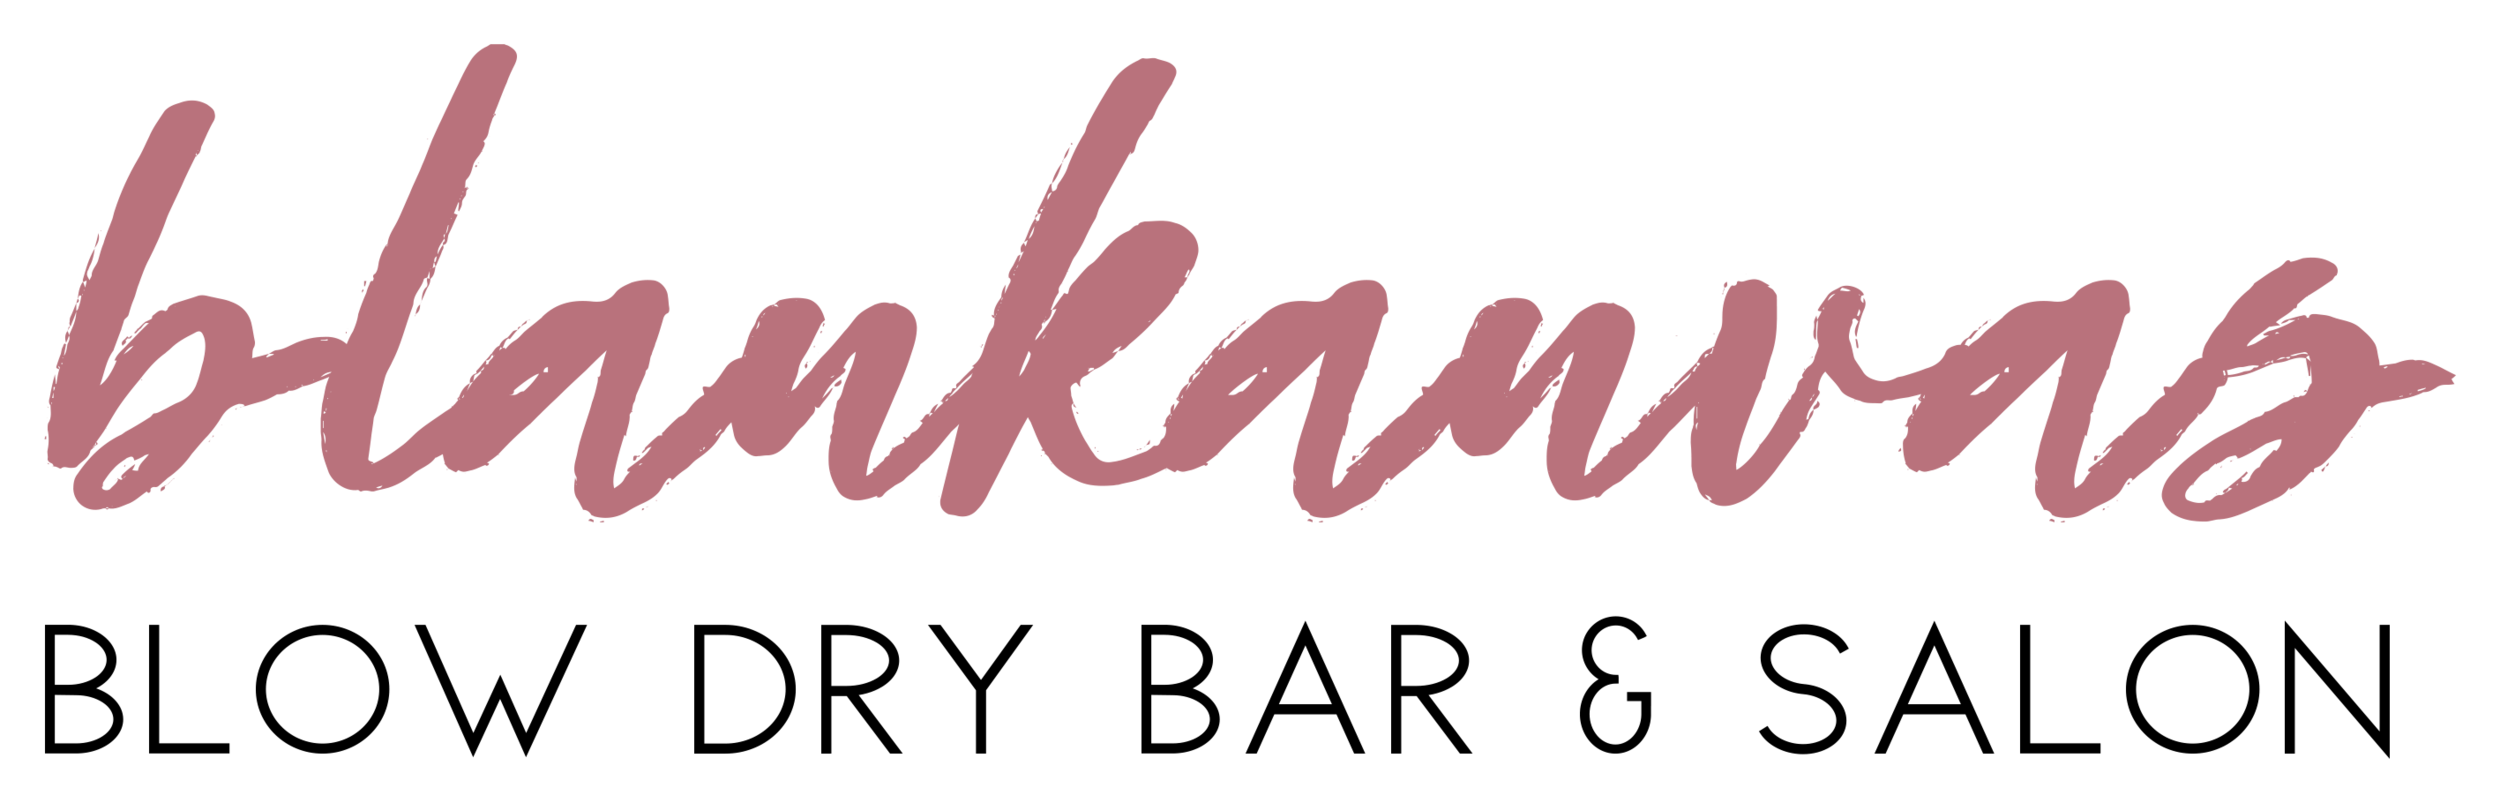 blankanvas-logo.png